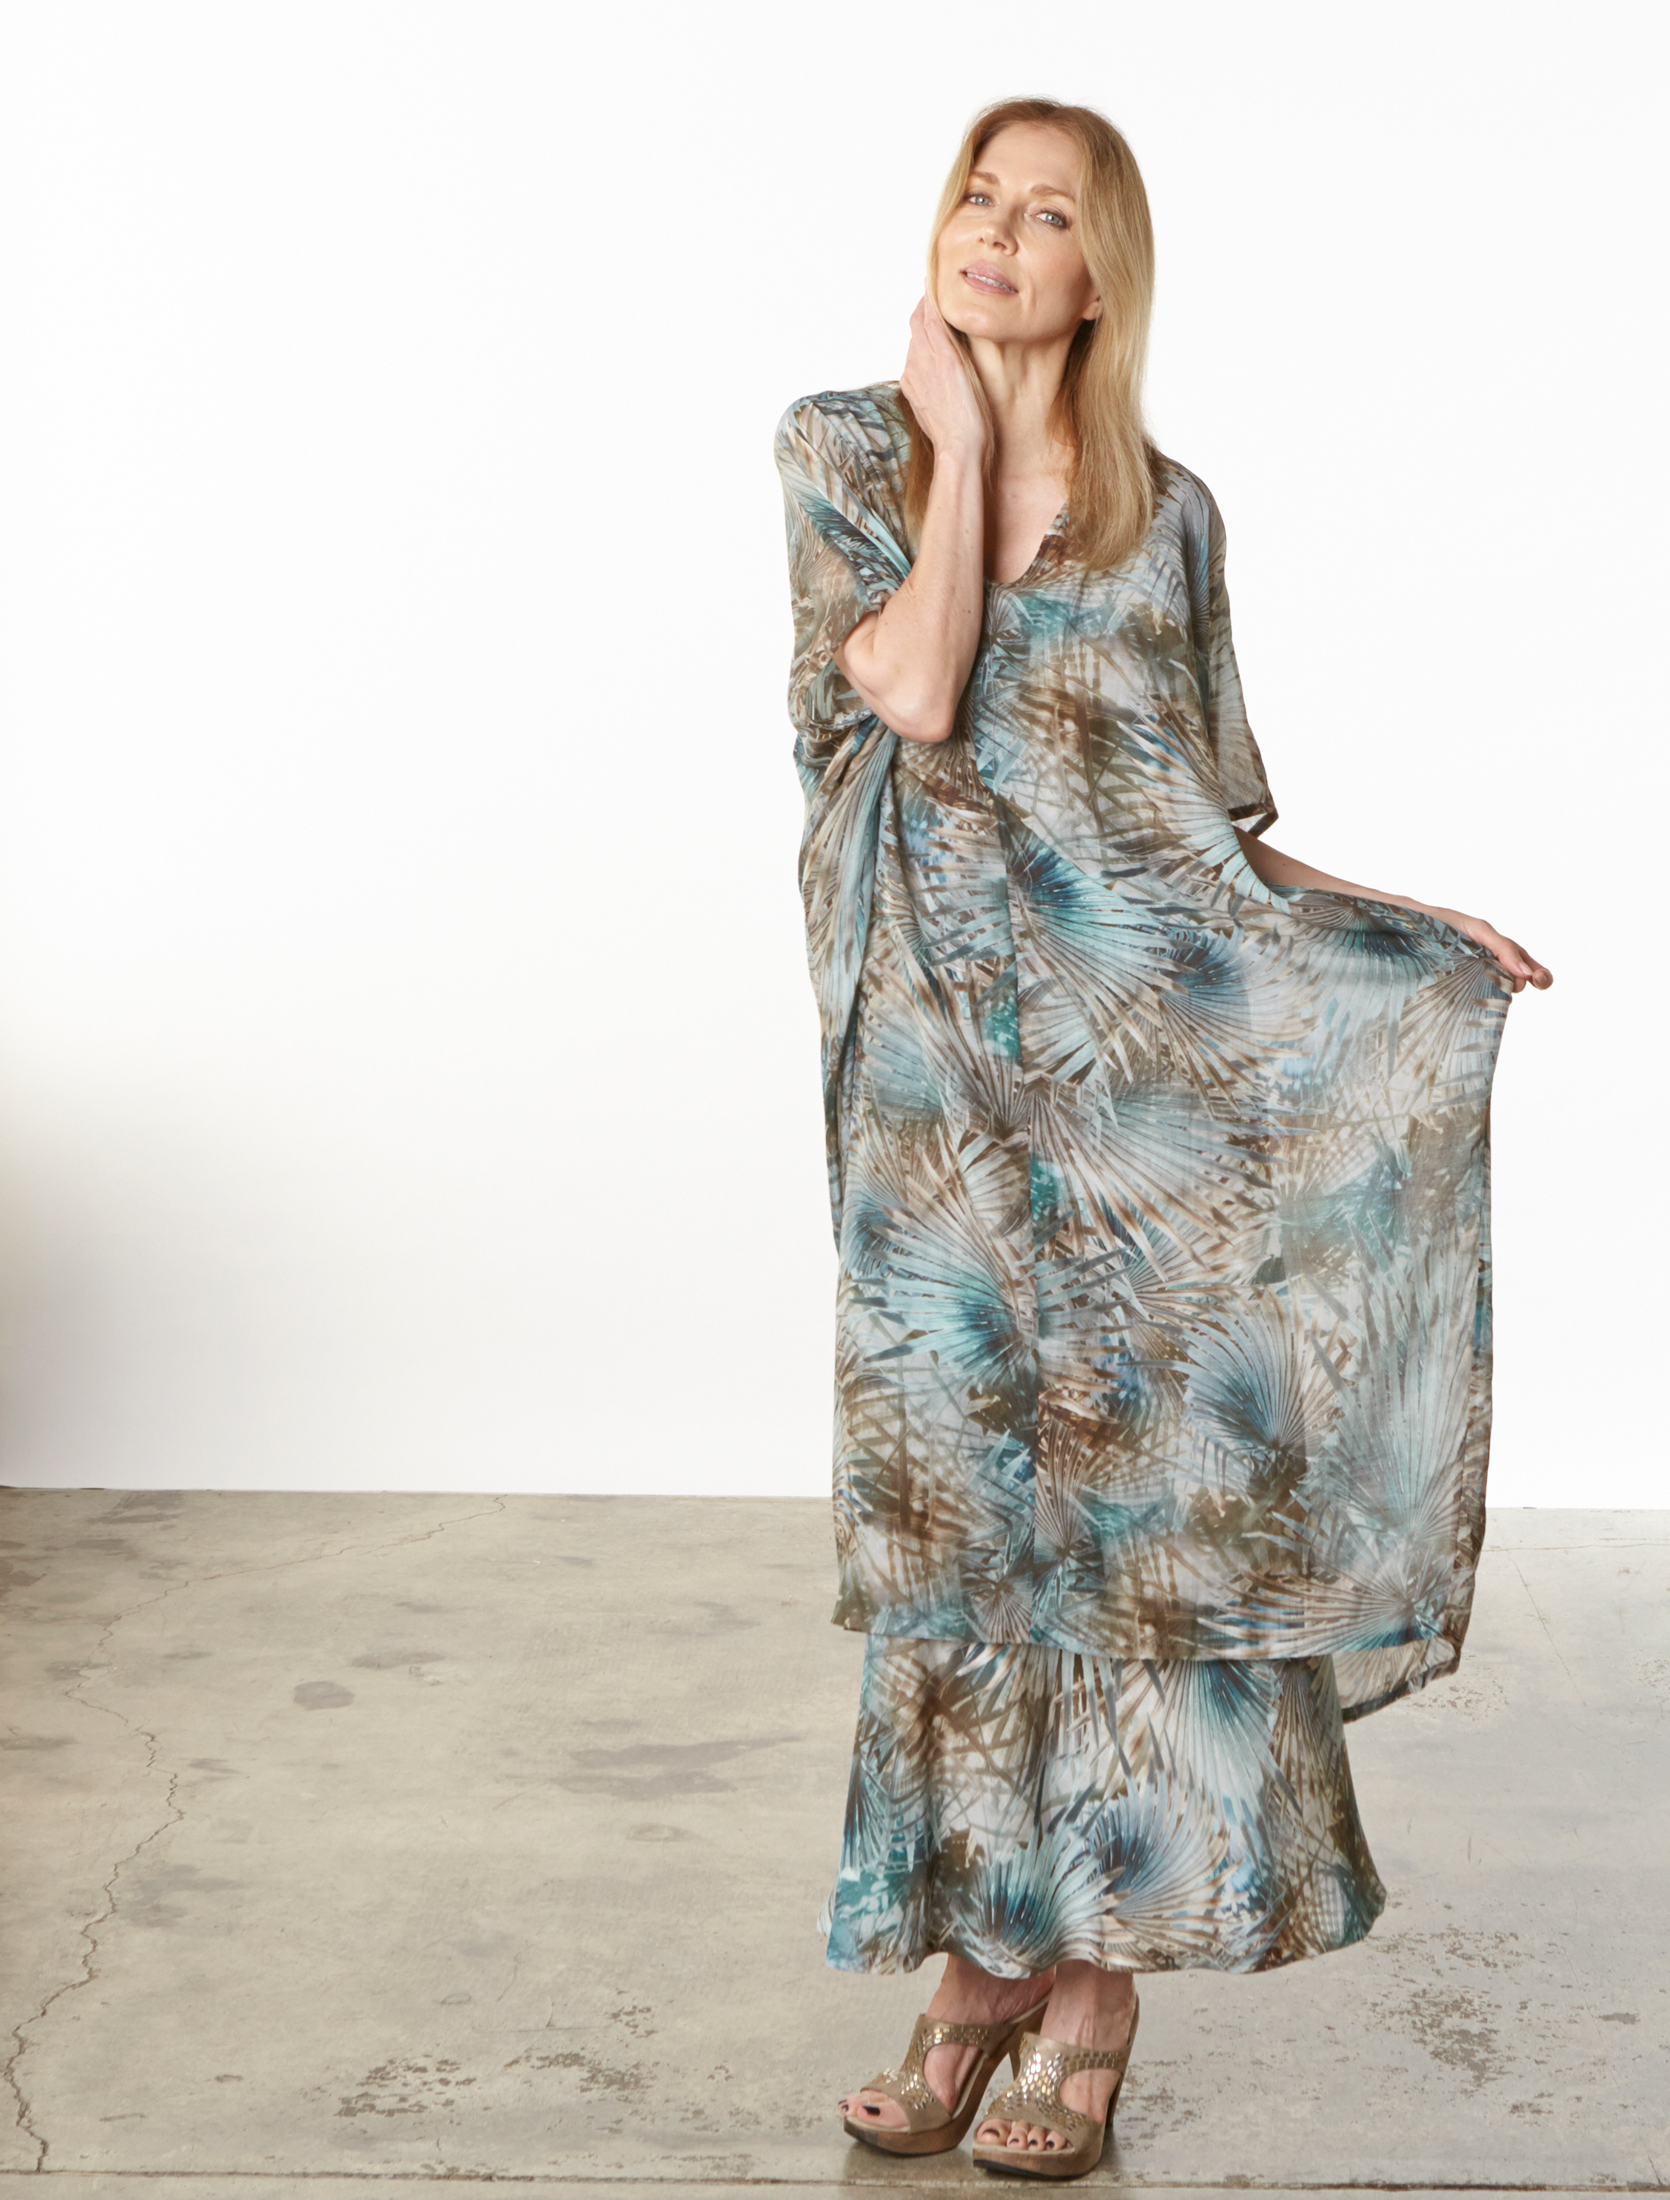 Petra Dress in Palma Italian Cotton/Silk, Long Bias Skirt in Palma Italian Linen